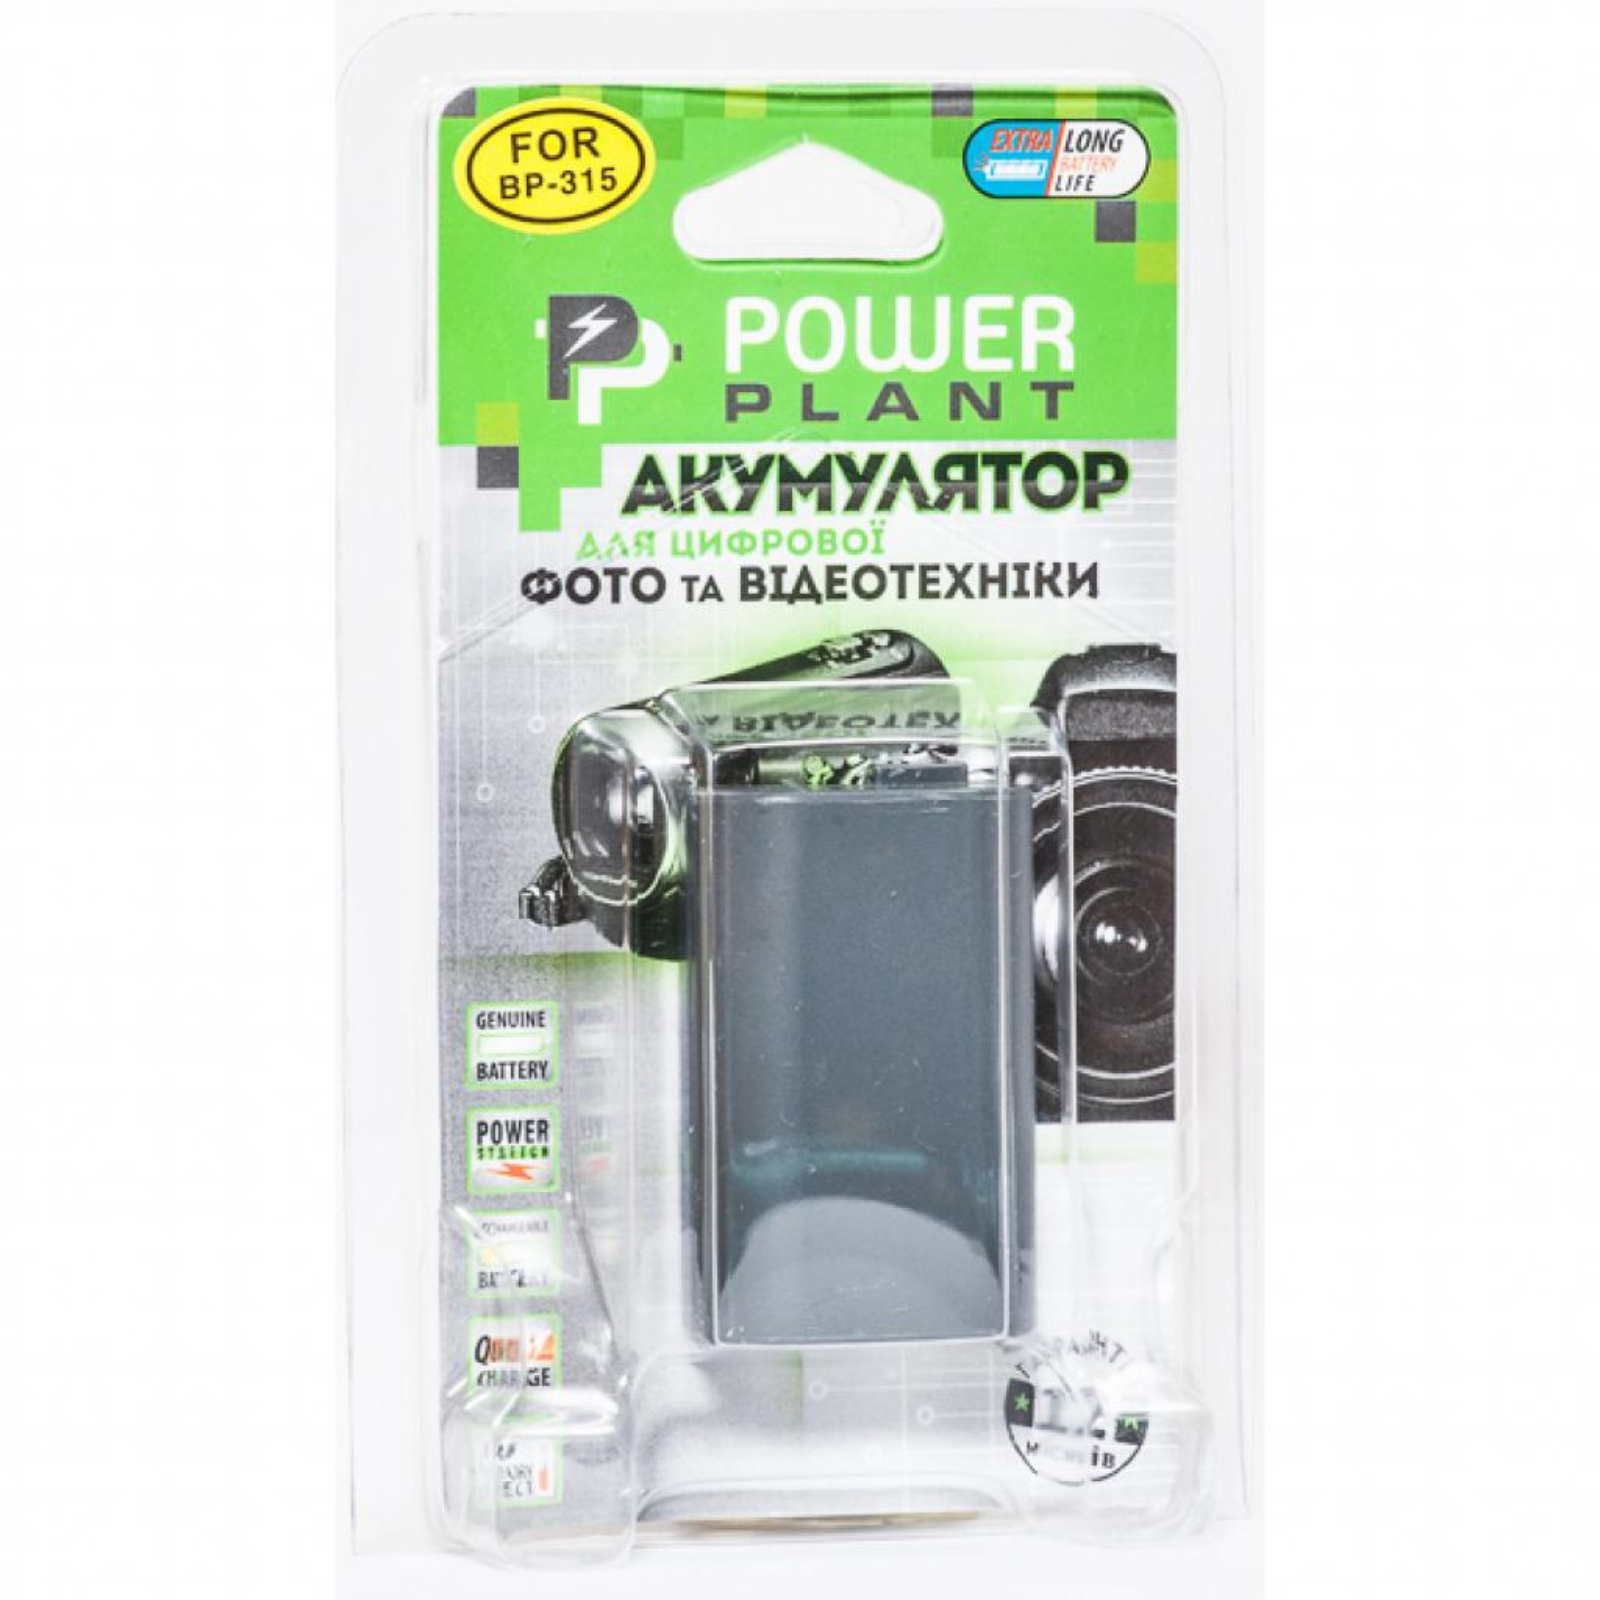 Аккумулятор к фото/видео PowerPlant Canon BP-315 (DV00DV1078) изображение 3